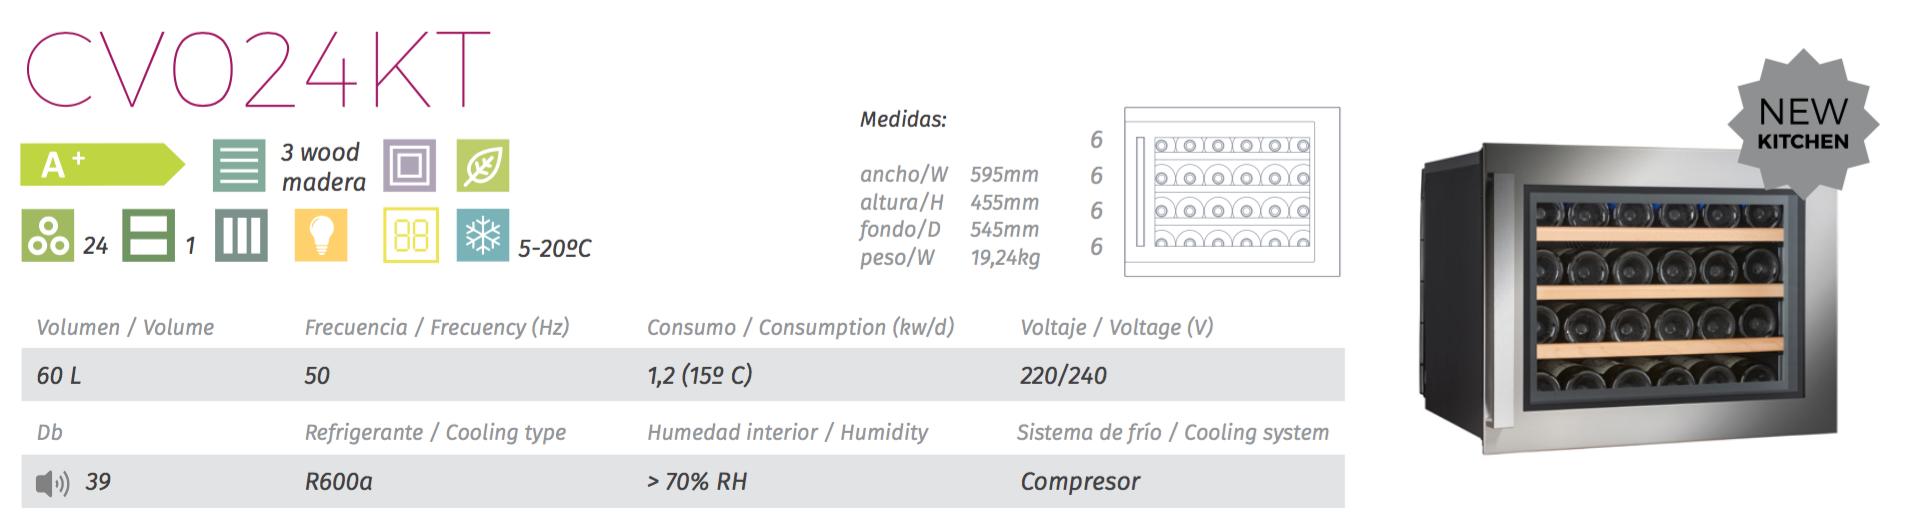 vinoteca cavanova CV024KT tabla caracteristicas